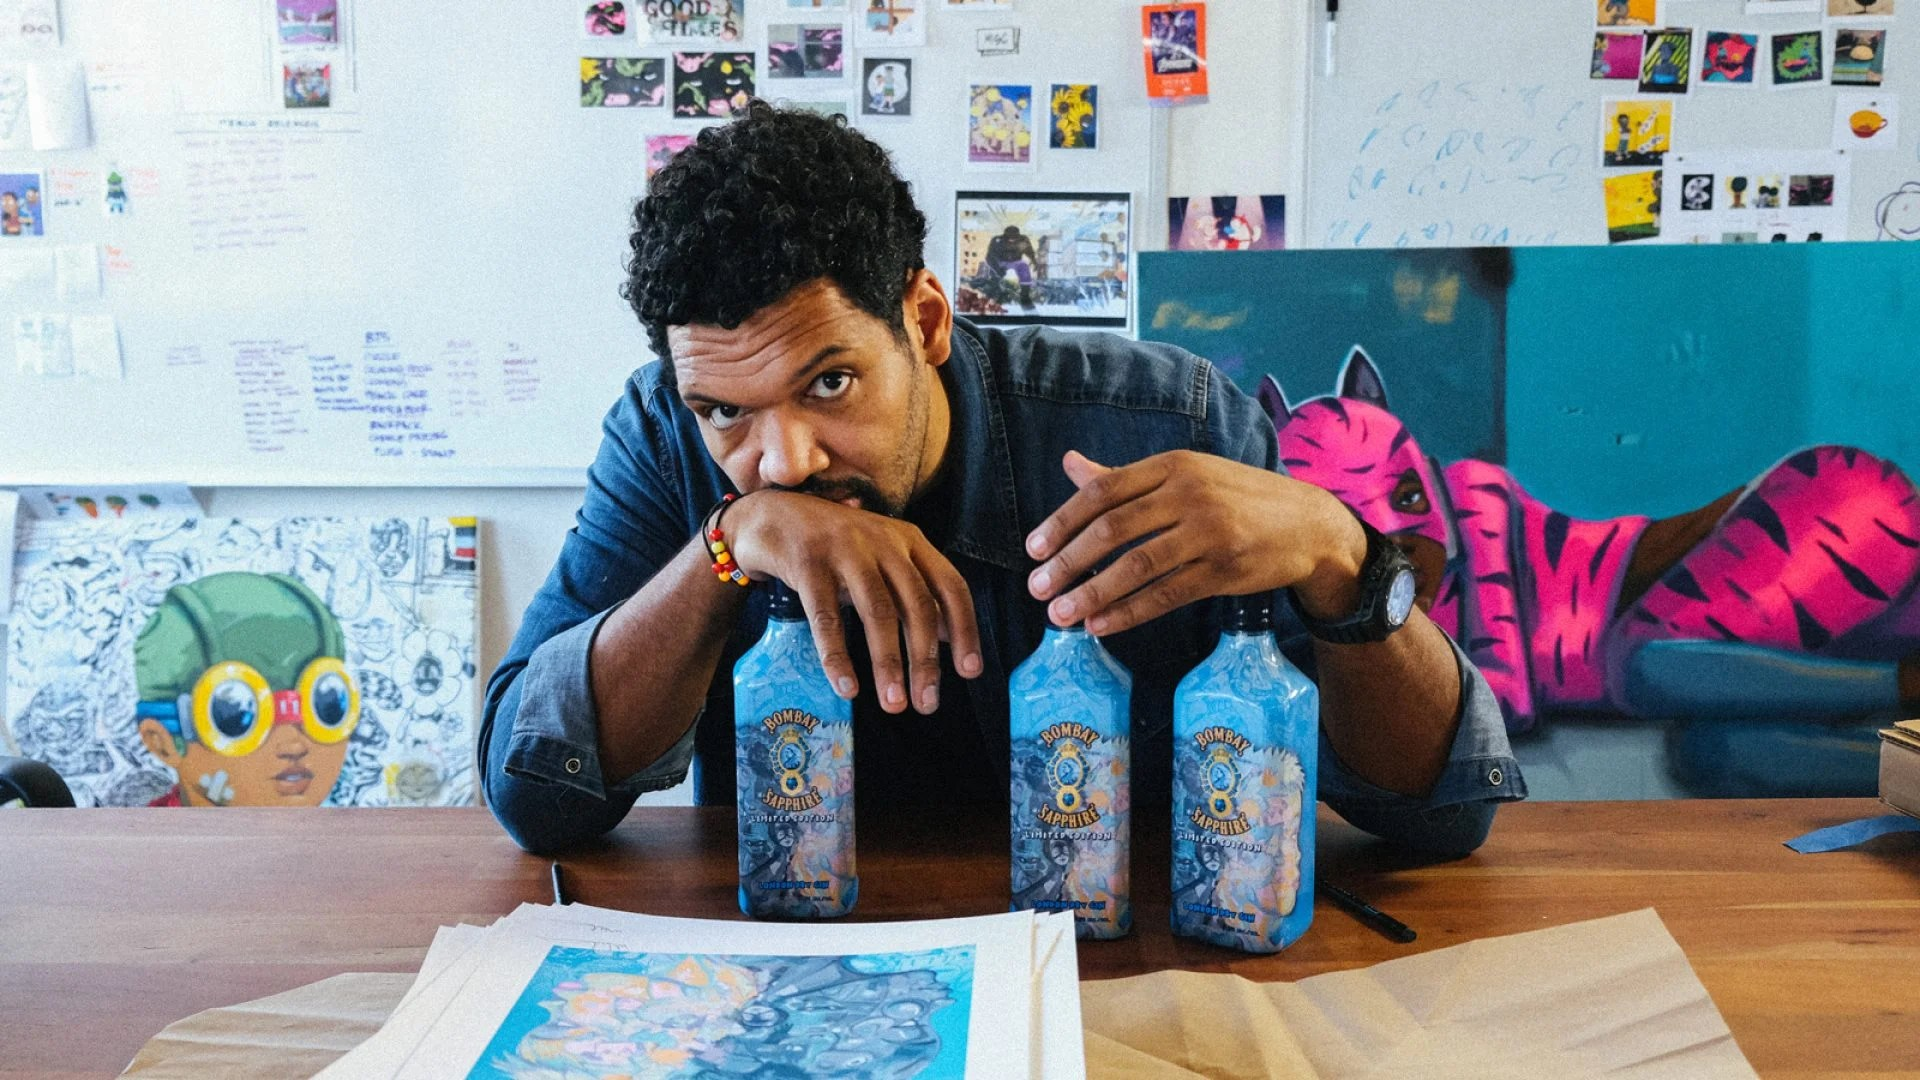 Artist Hebru Brantley Designs First Limited Edition Bombay Bottle